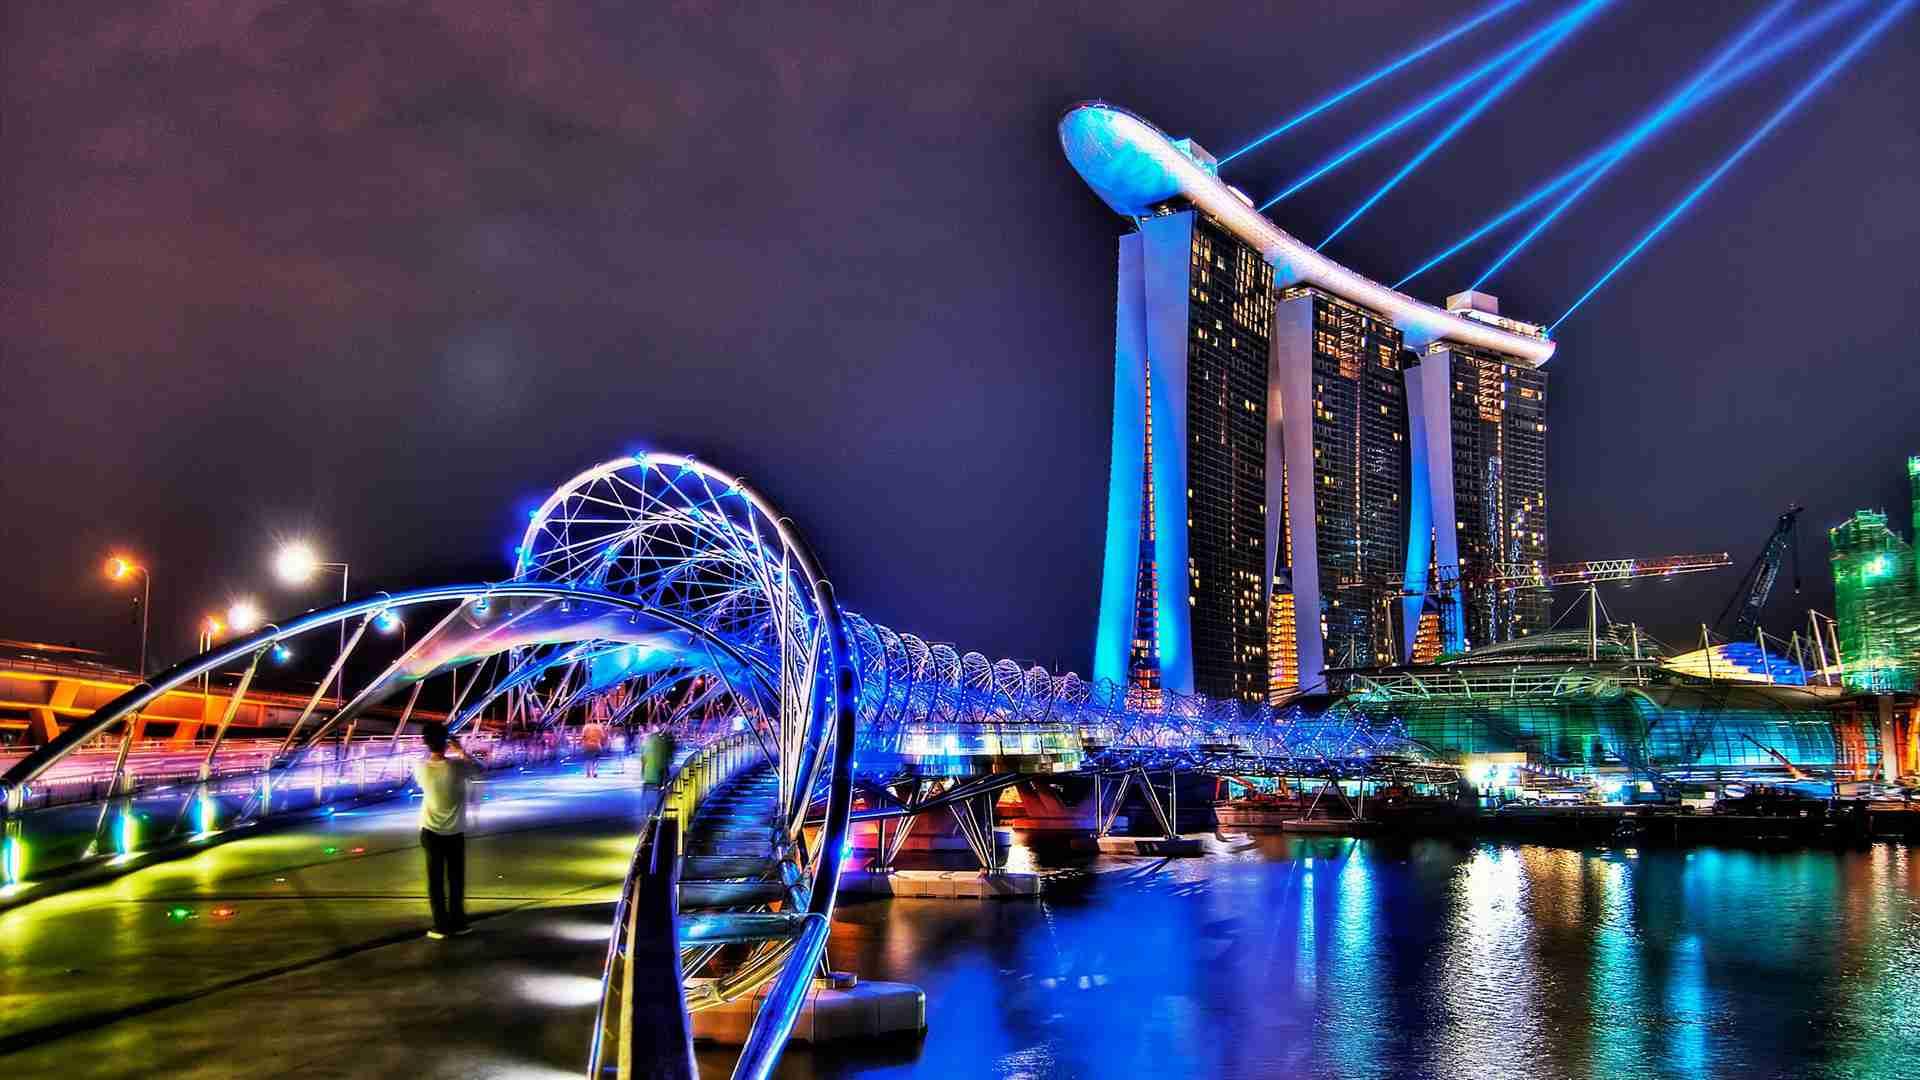 Singapore Bridges Skyscrapers Marina Bay Sands Hotel Wallpaper Hd